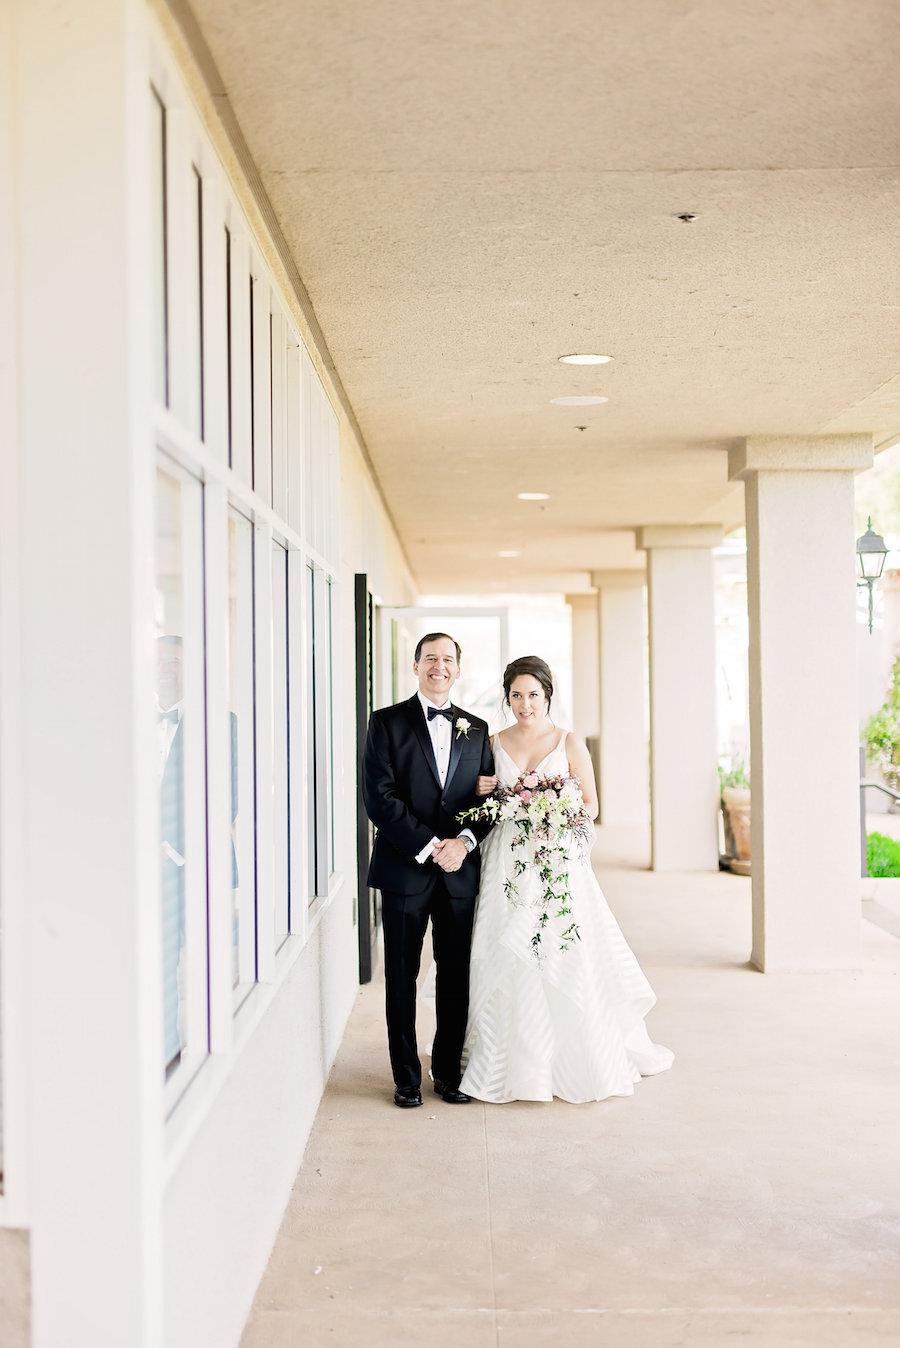 Rachel-Sergio-Wedding-Pharris-Photos-0068.jpg